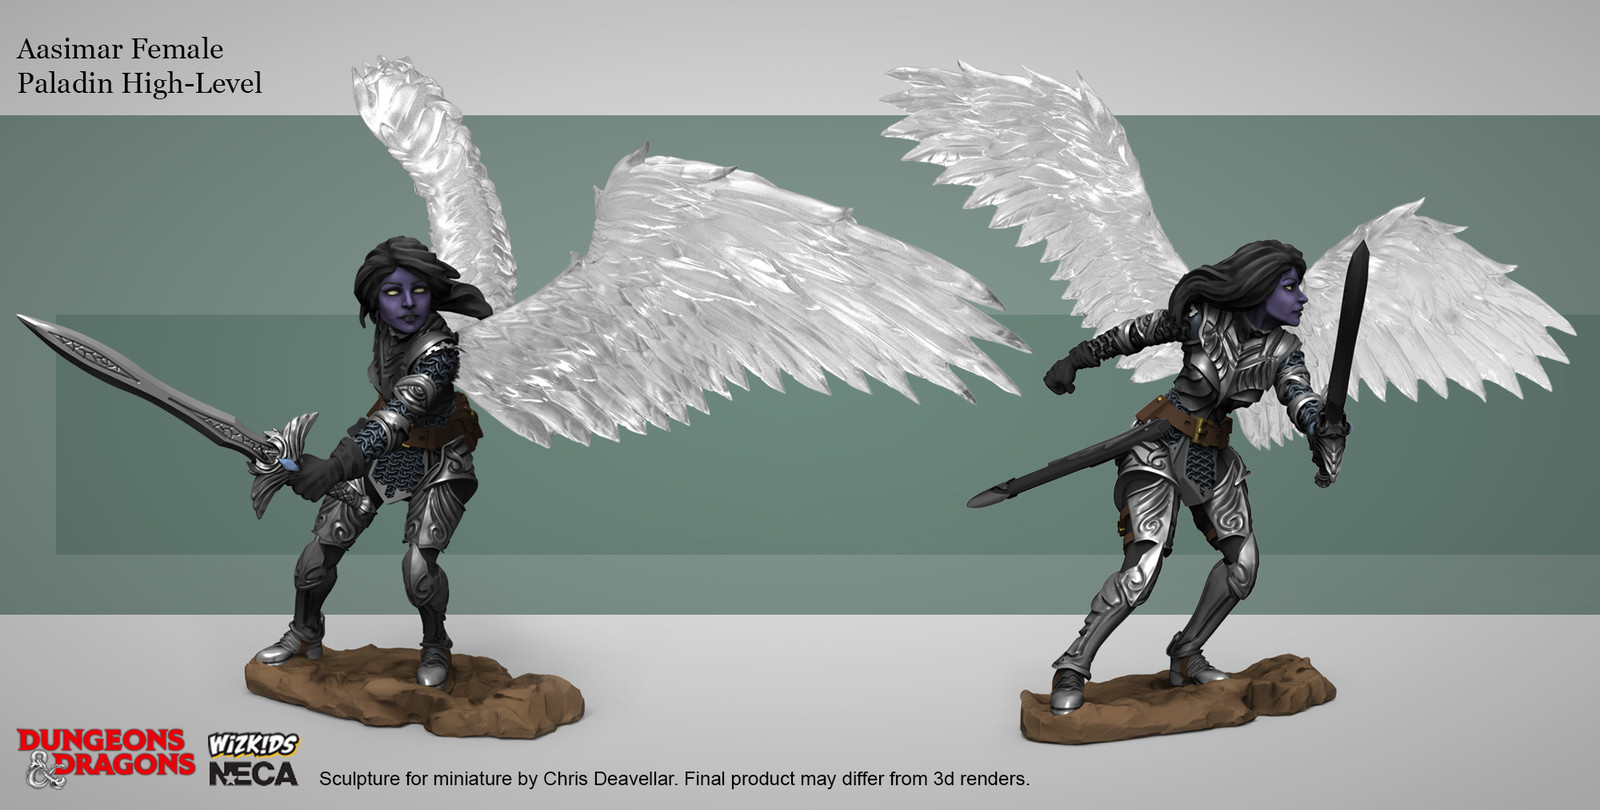 Dungeons & Dragons Nolzur's Marvelous Miniatures. The actual miniatures are unpainted.